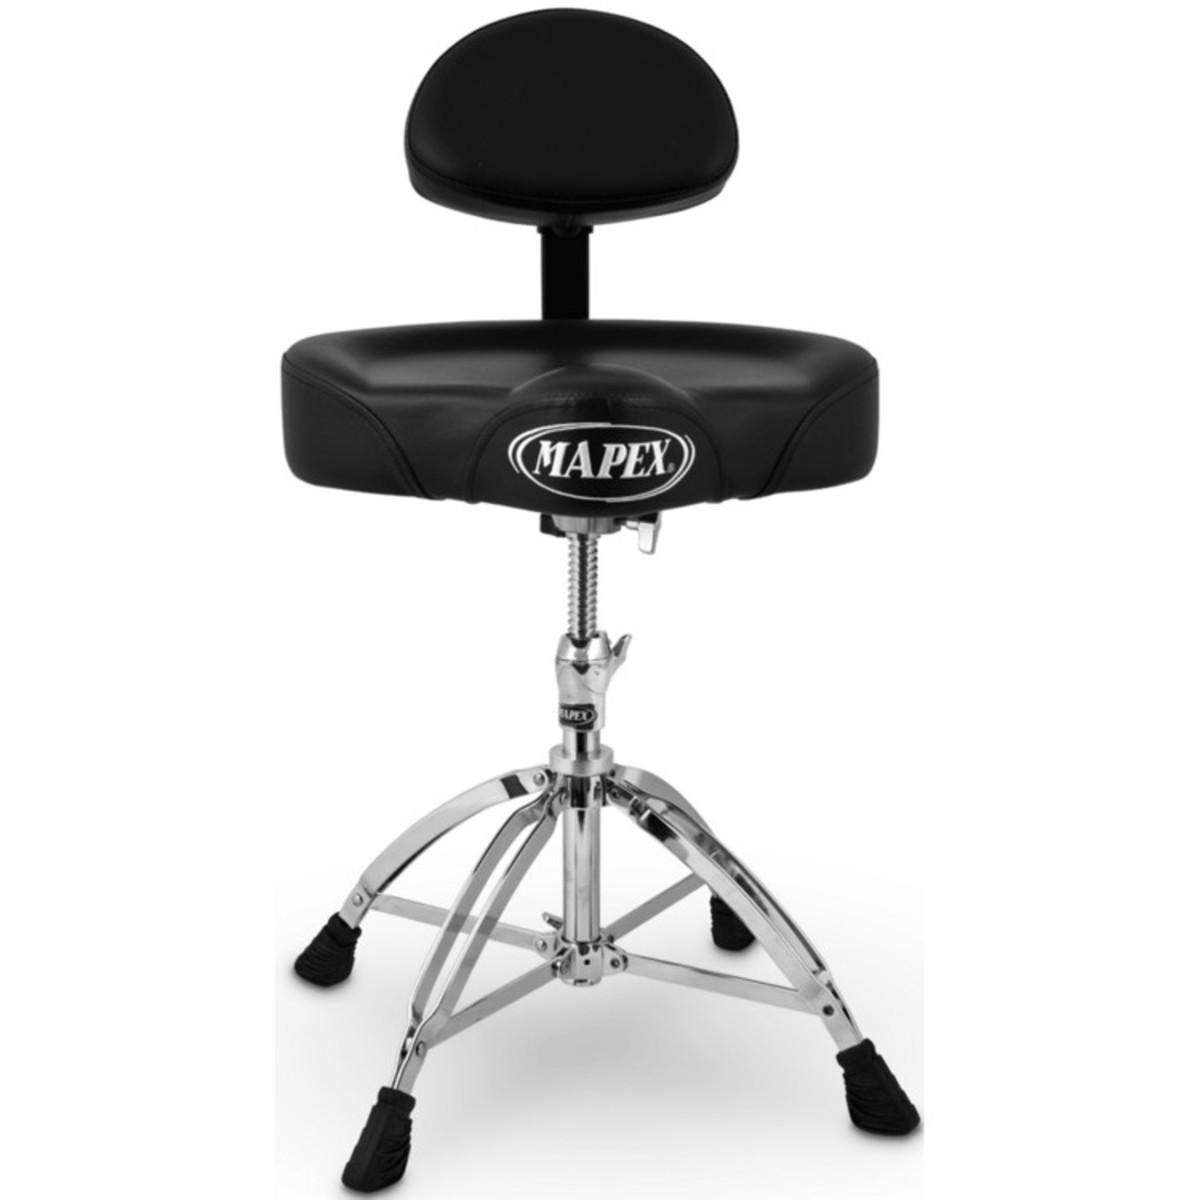 Mapex Drum Stool Saddle Top With Backrest 4 Leg Base